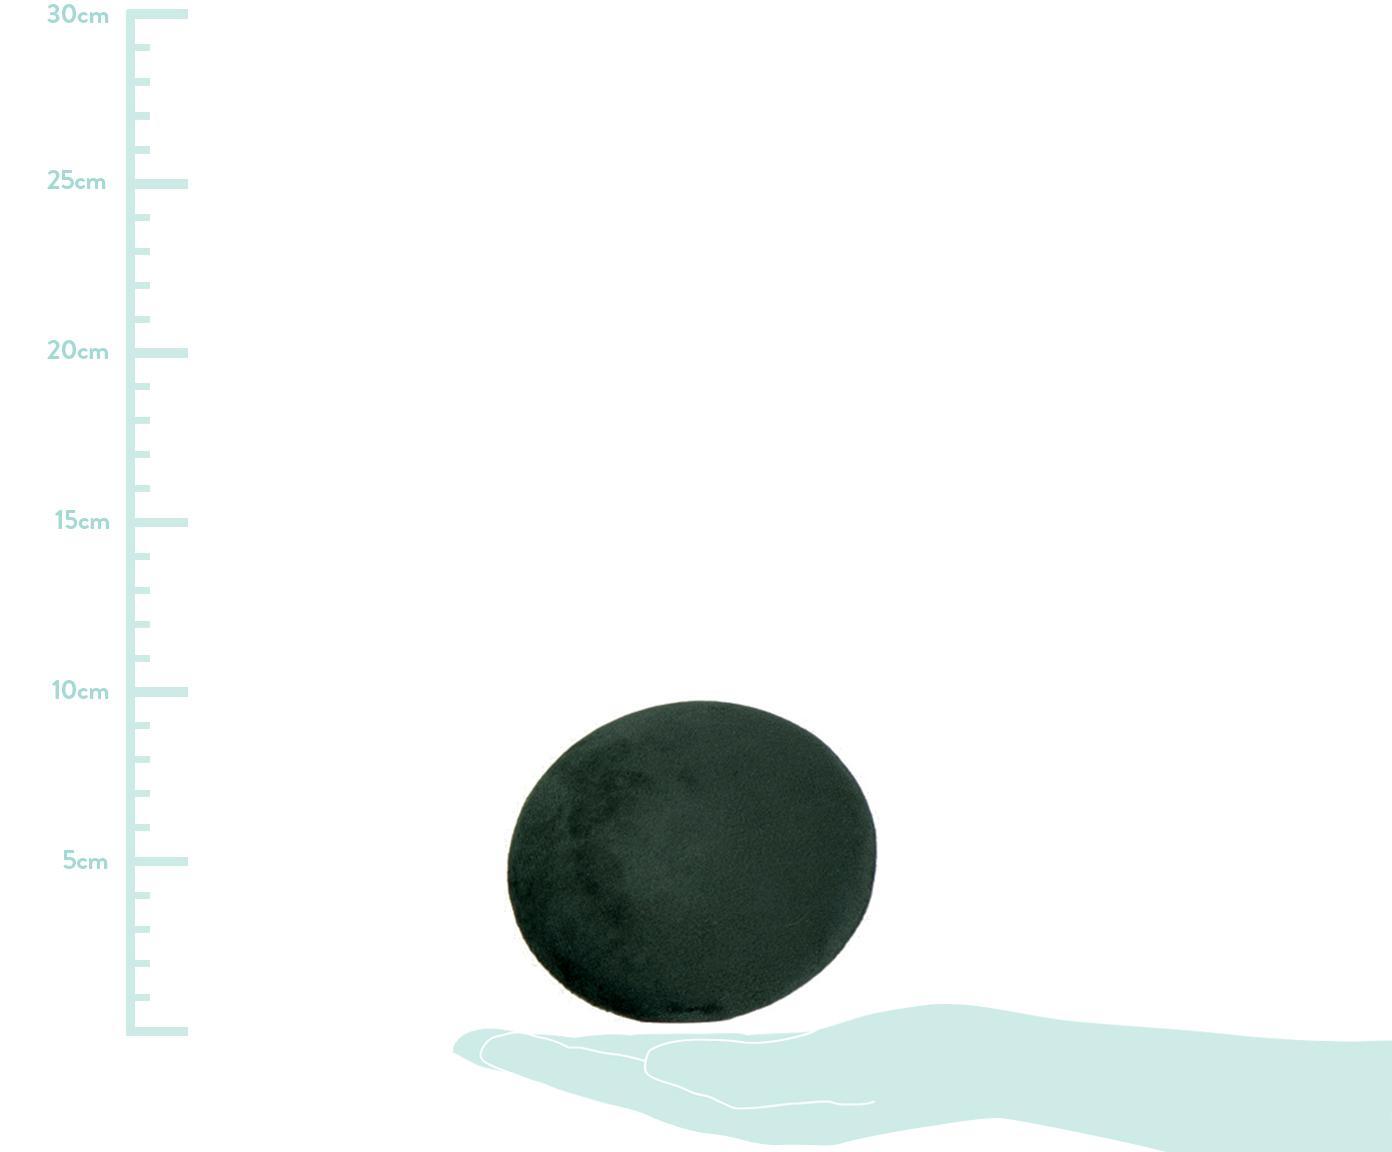 Samt-Haken-Set Giza, 3-tlg., Front: Samt, Dunkelgrün, Messingfarben, Sondergrößen